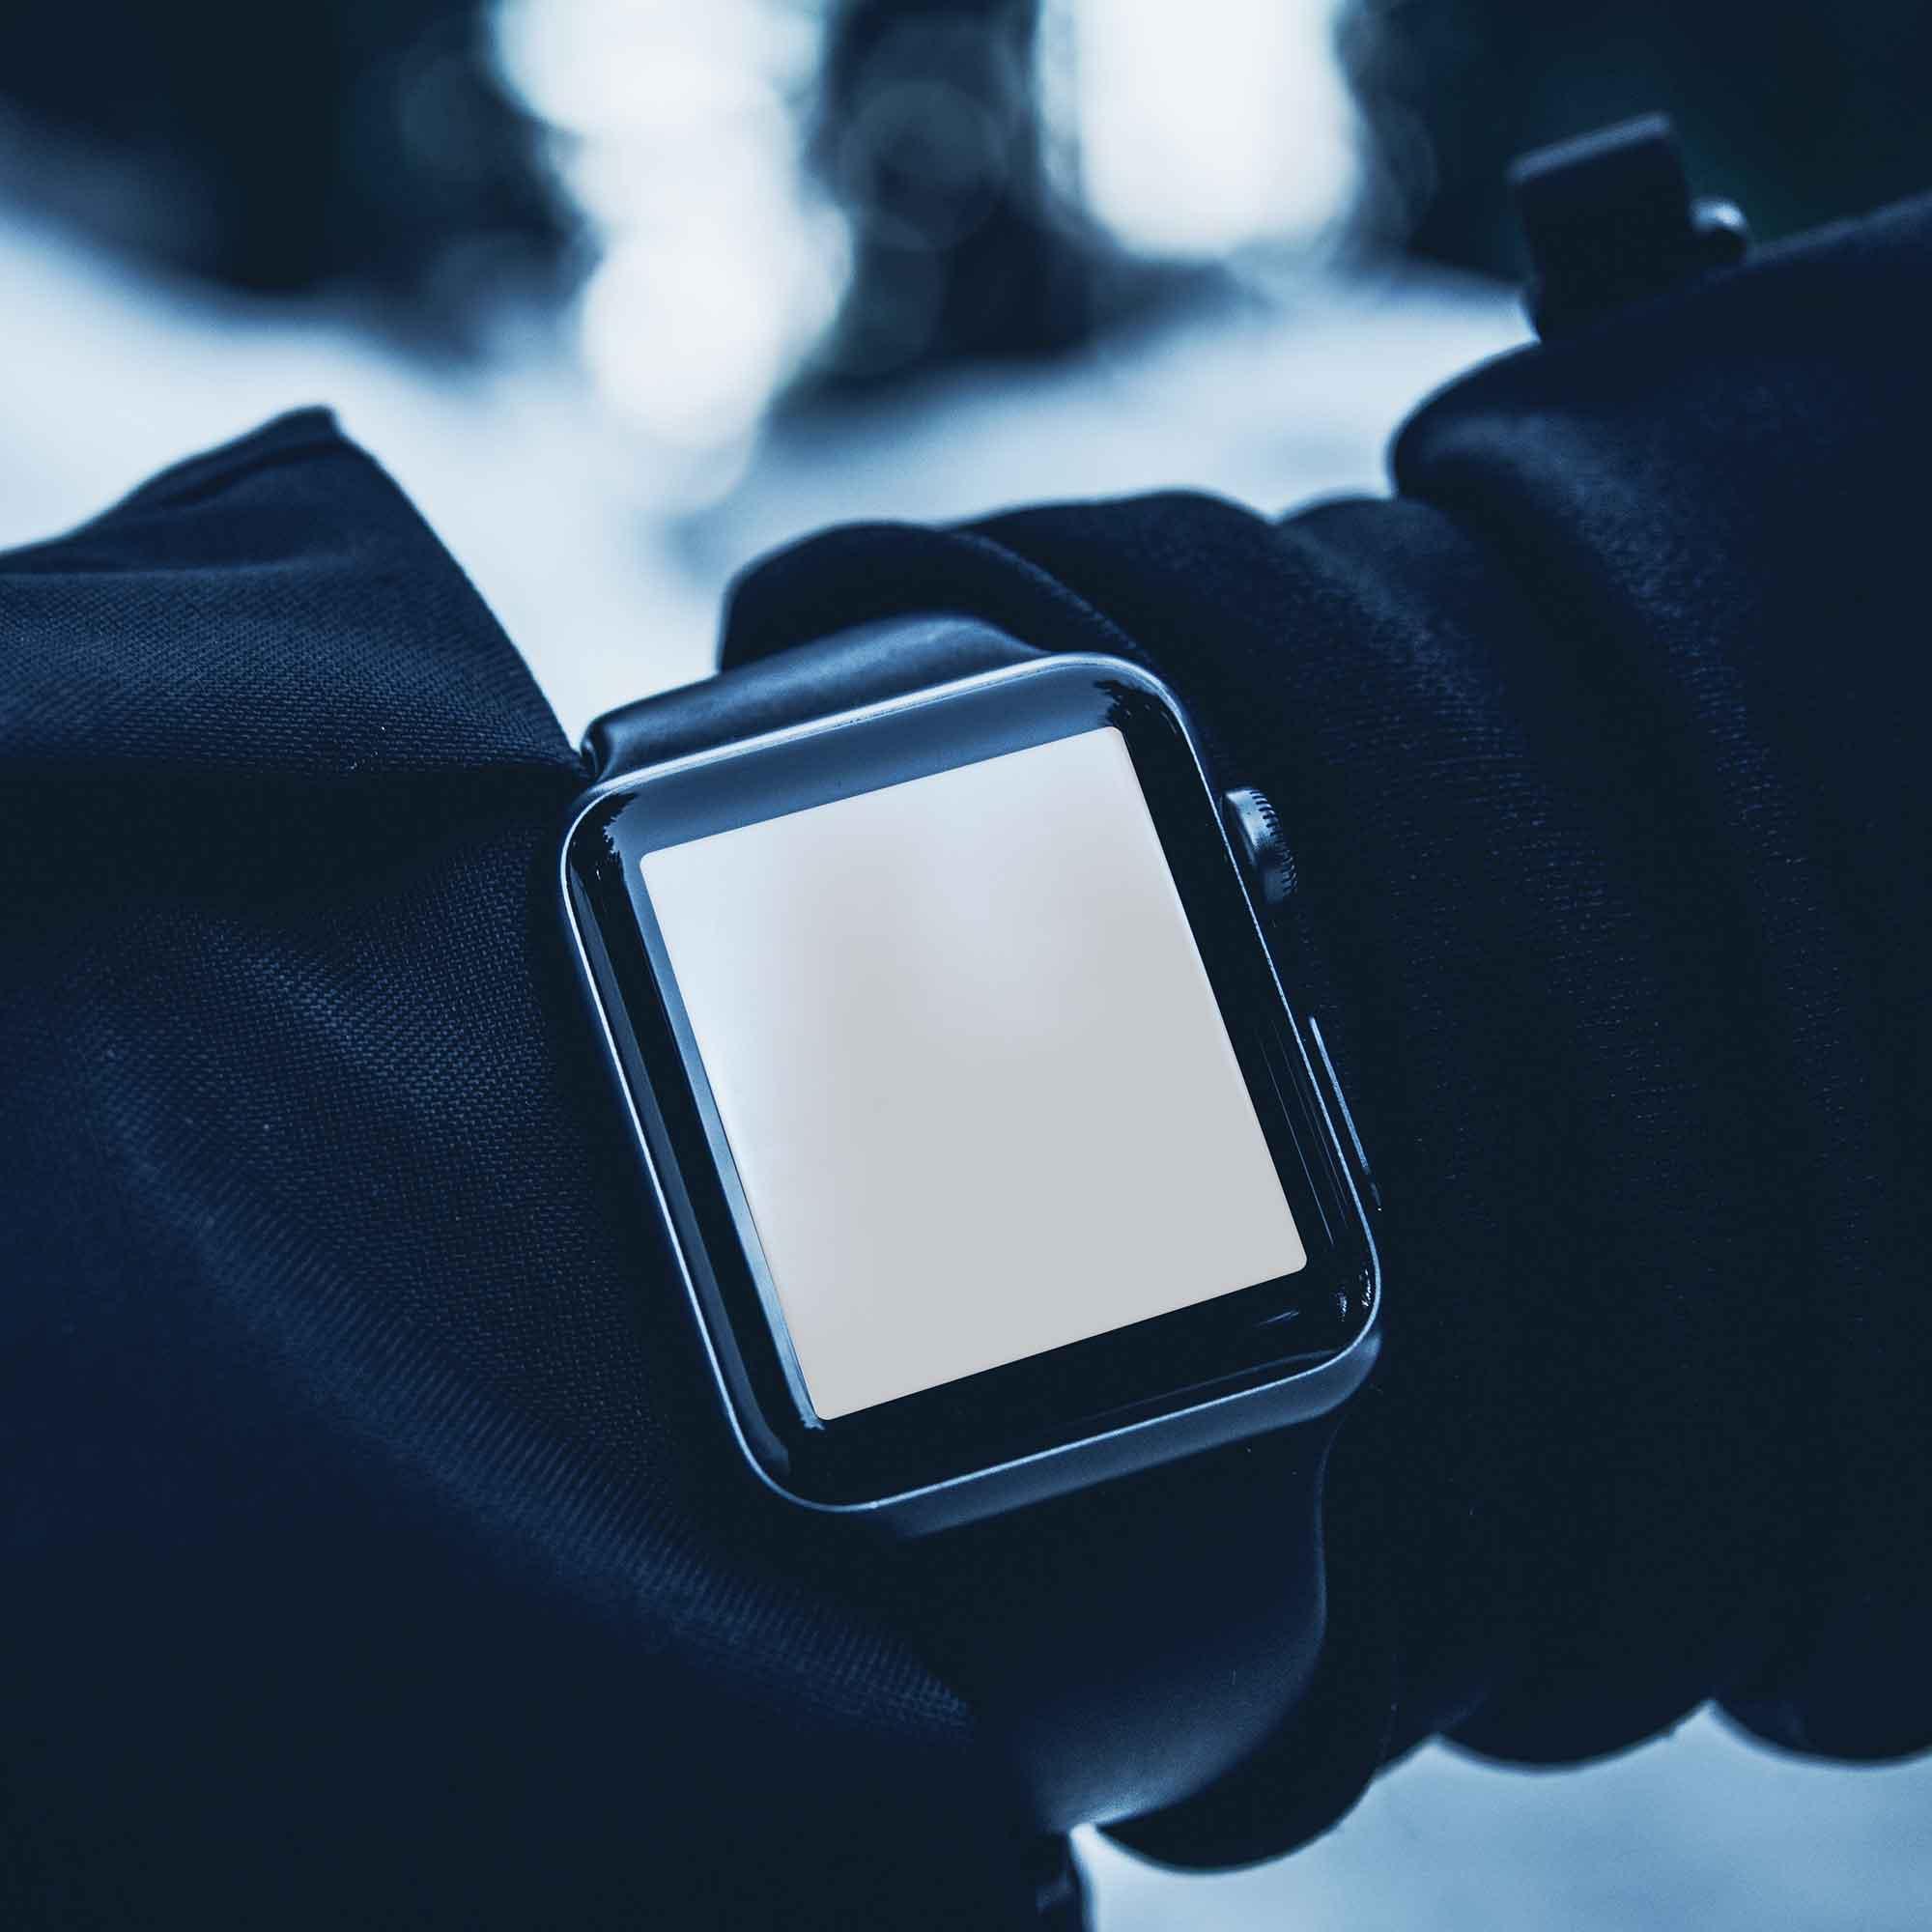 In Hand Apple Watch Mockup 2